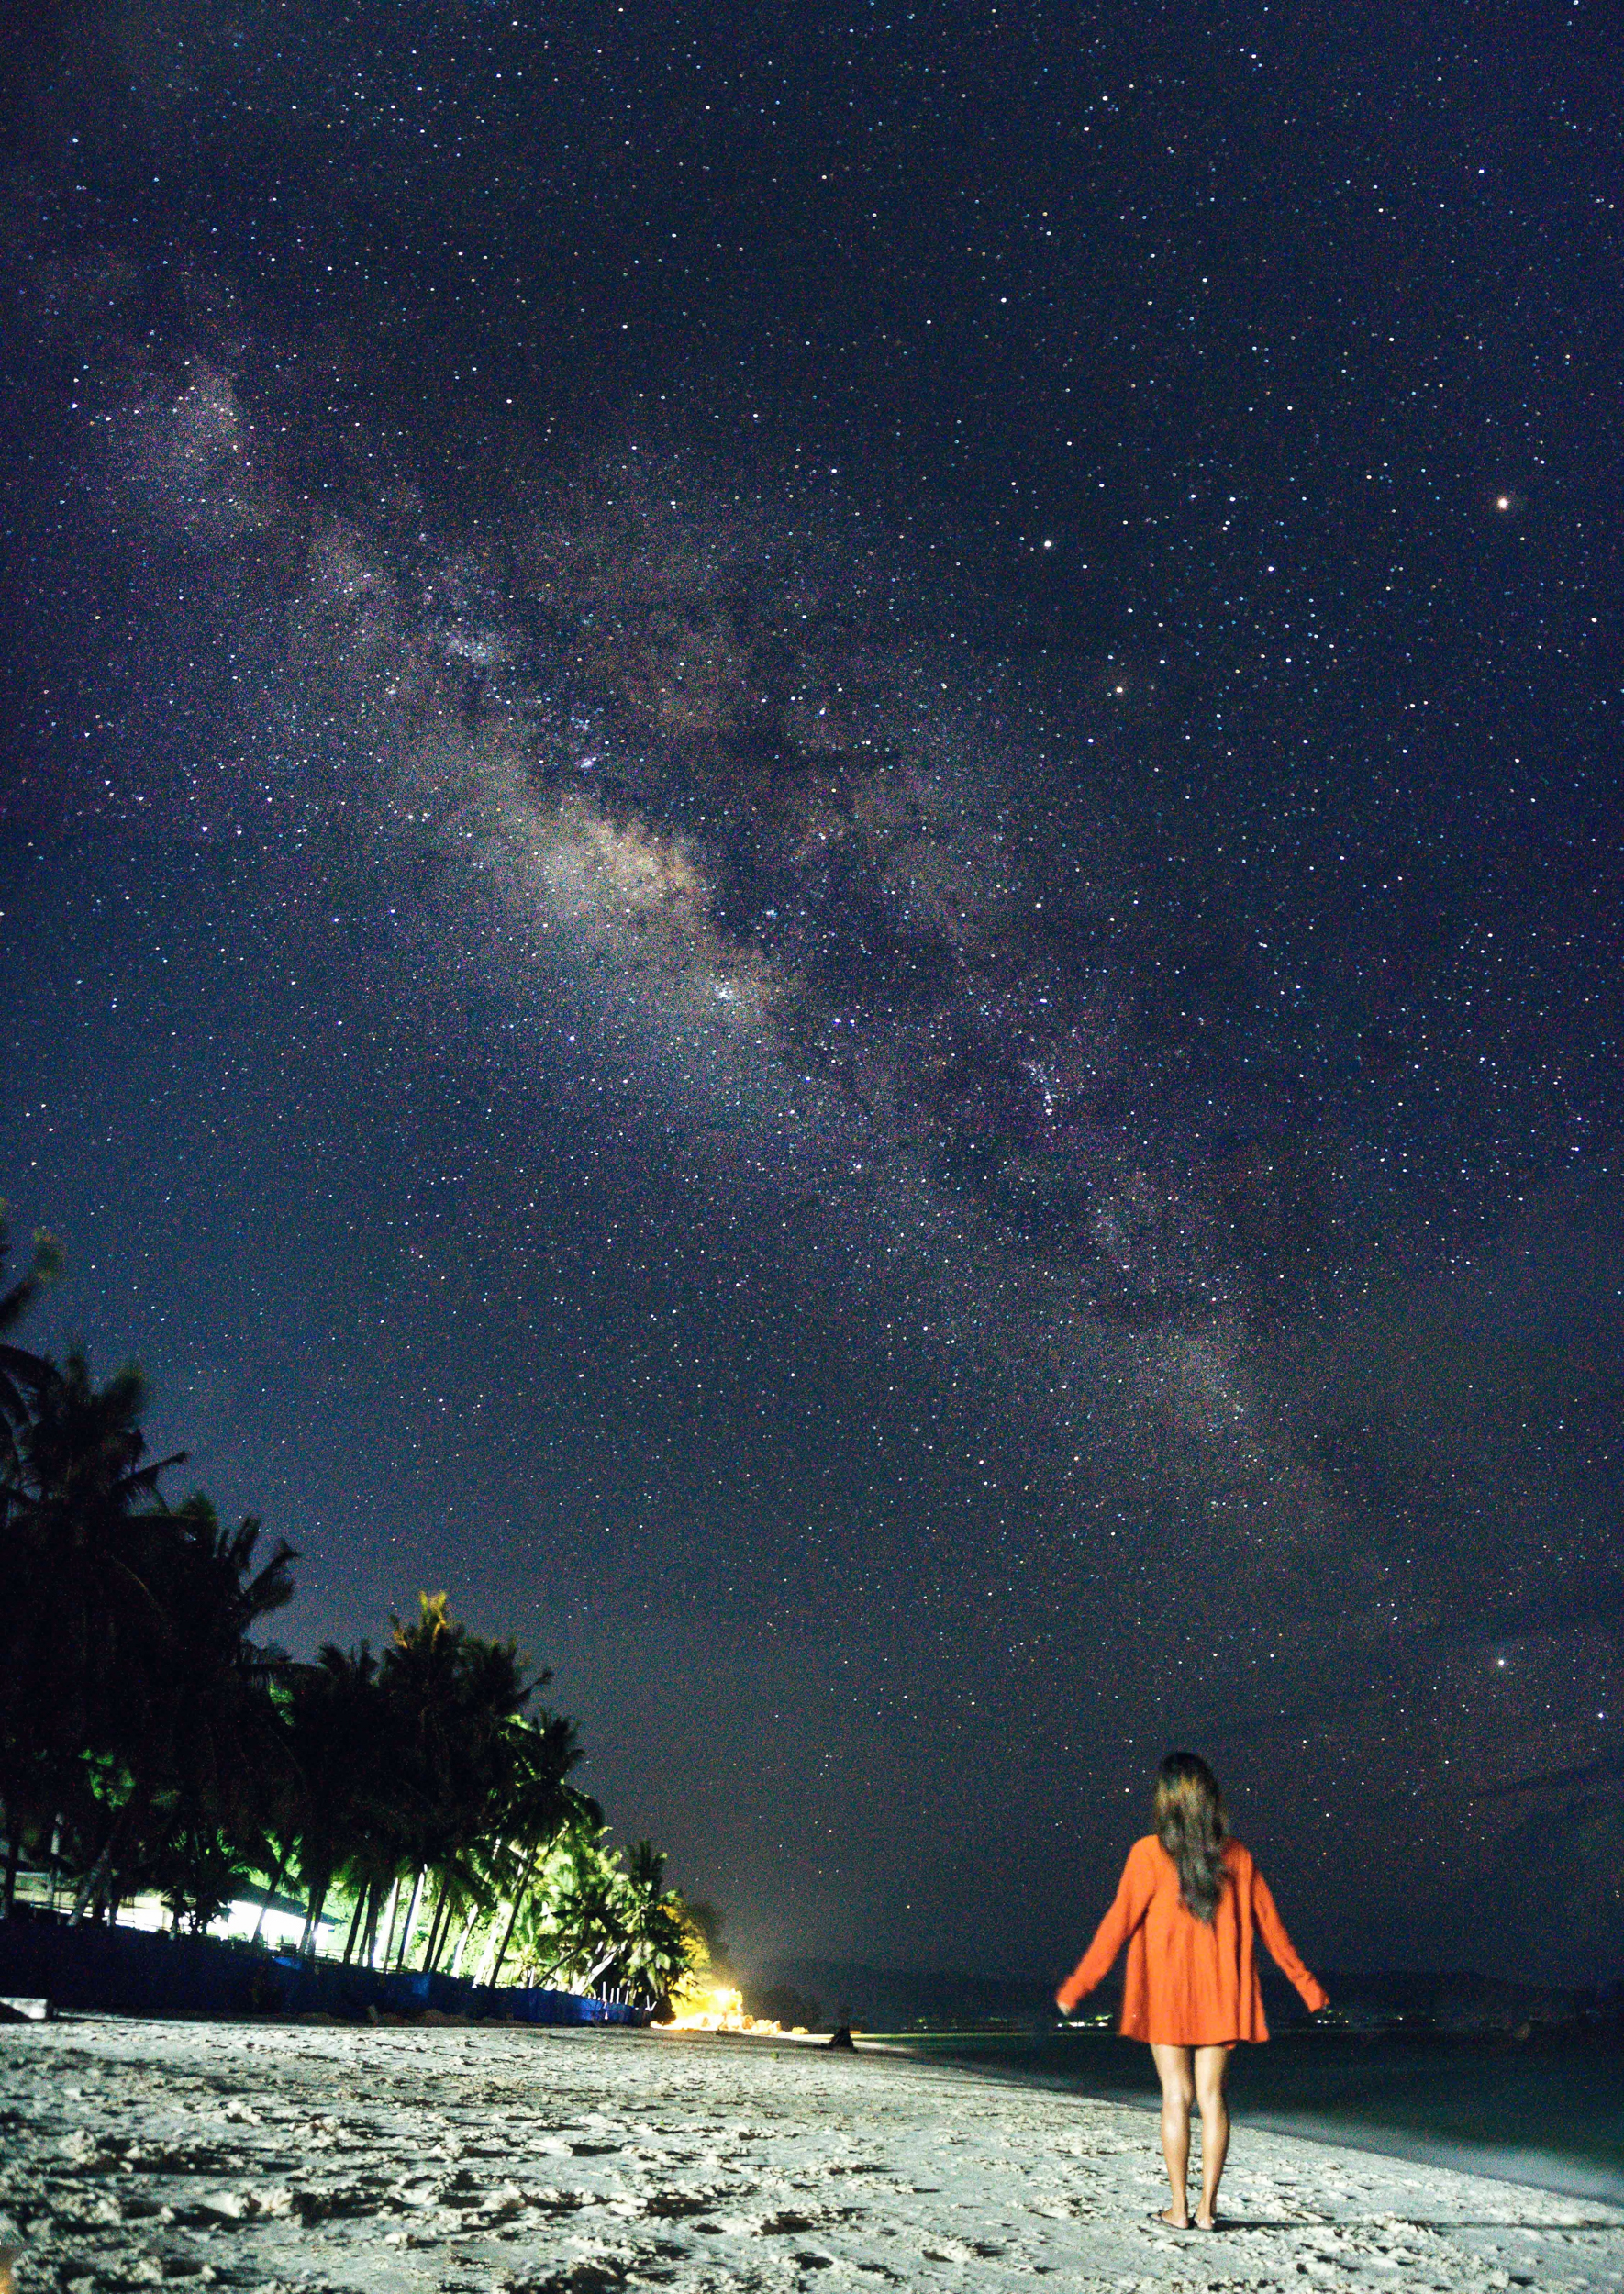 Her Milky Way - Philippines 2016